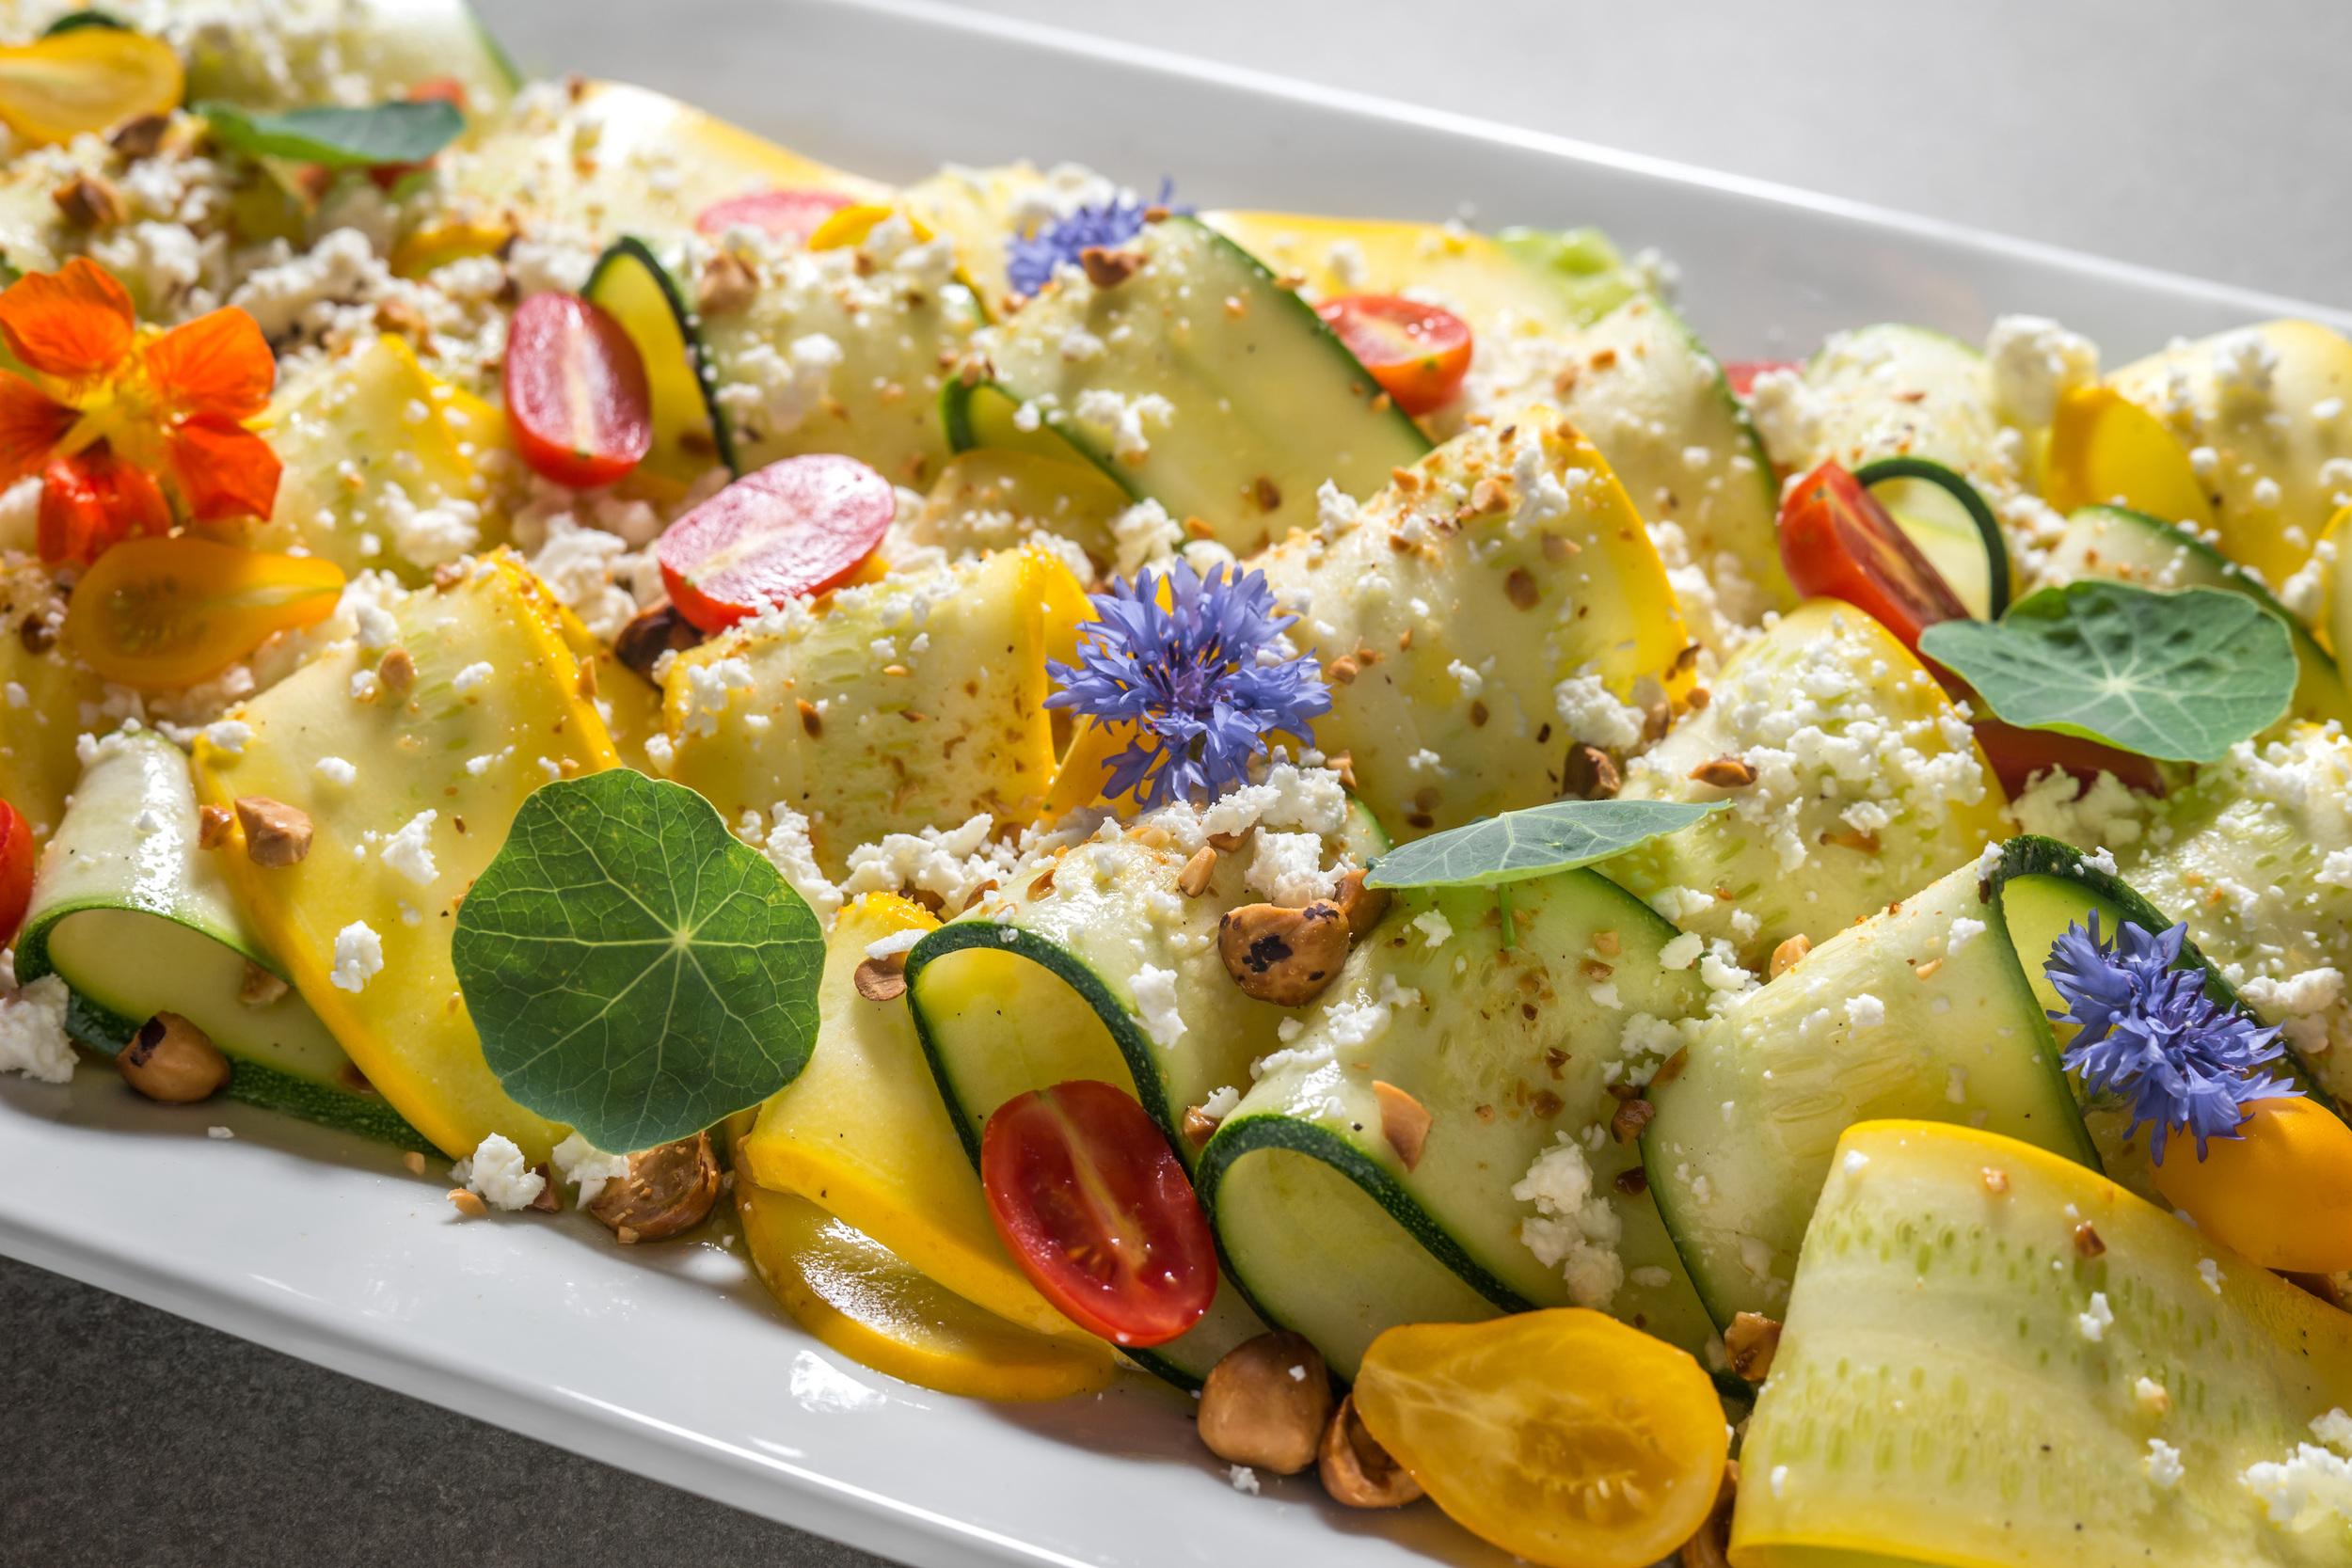 Summer squash salad with feta and hazelnuts